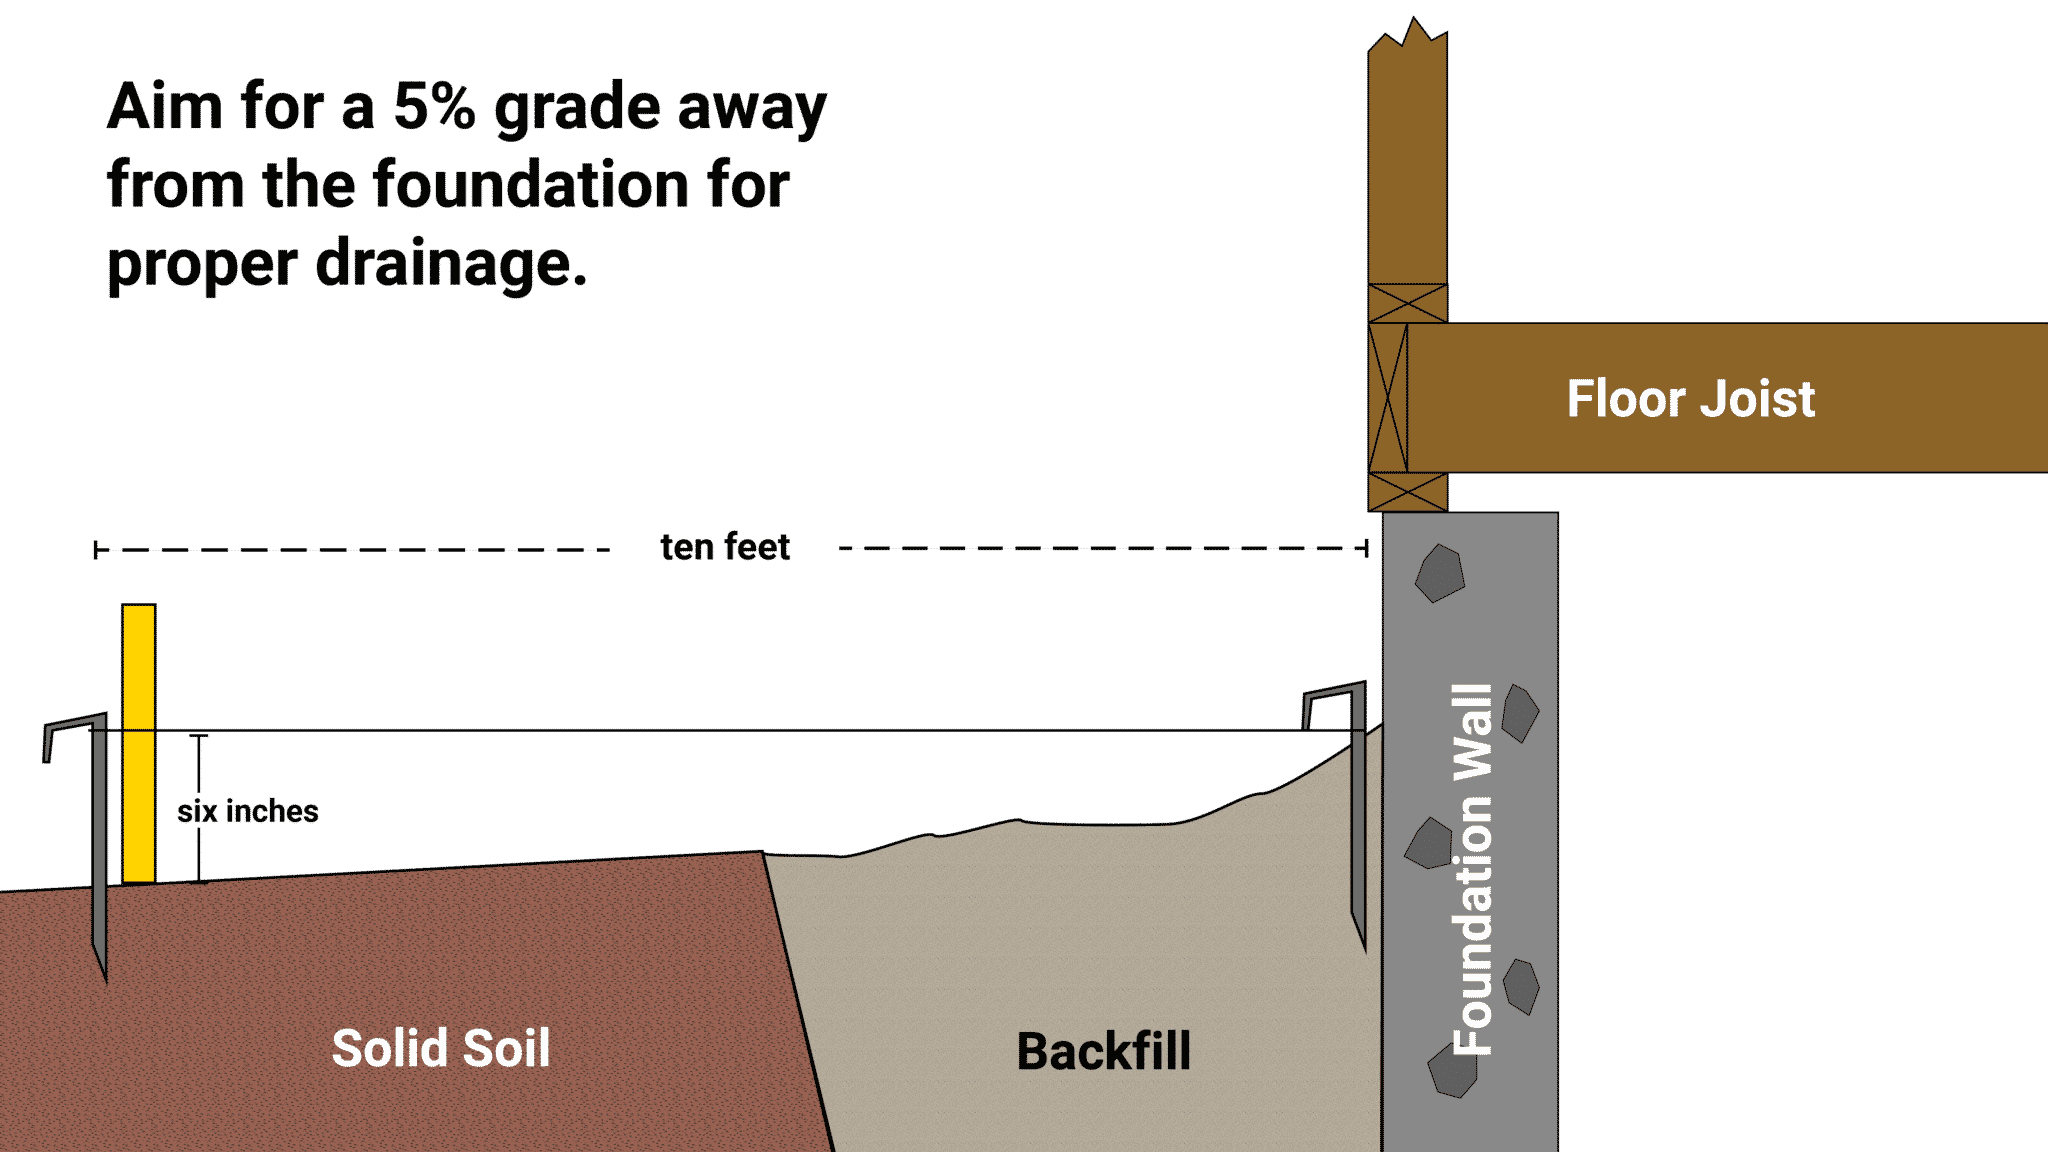 MDH Foundation Repair Drainage Problems Measure Grade